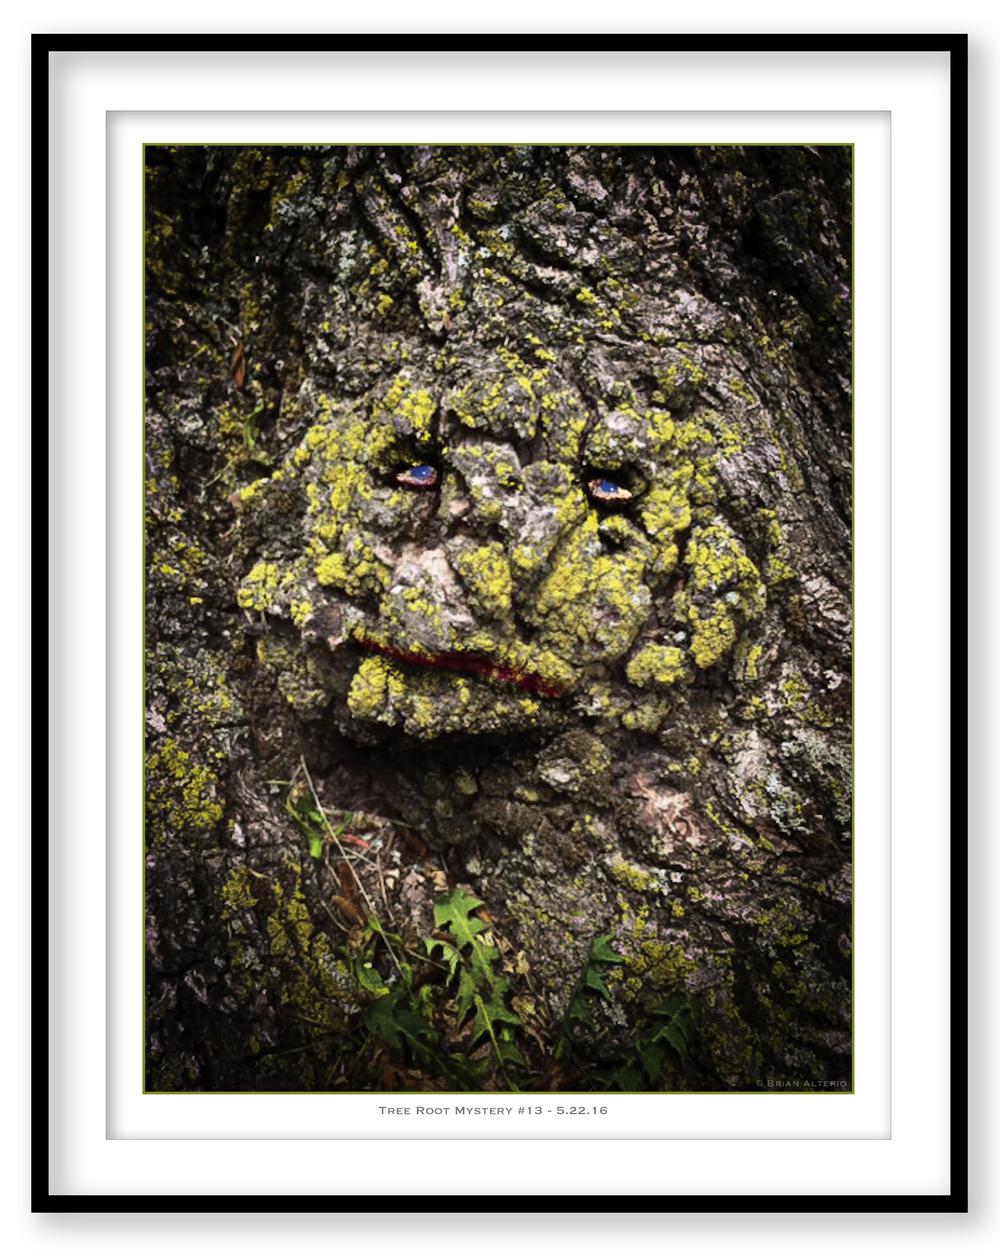 Tree Root Mystery #13 - 5.22.16 - Framed.jpg